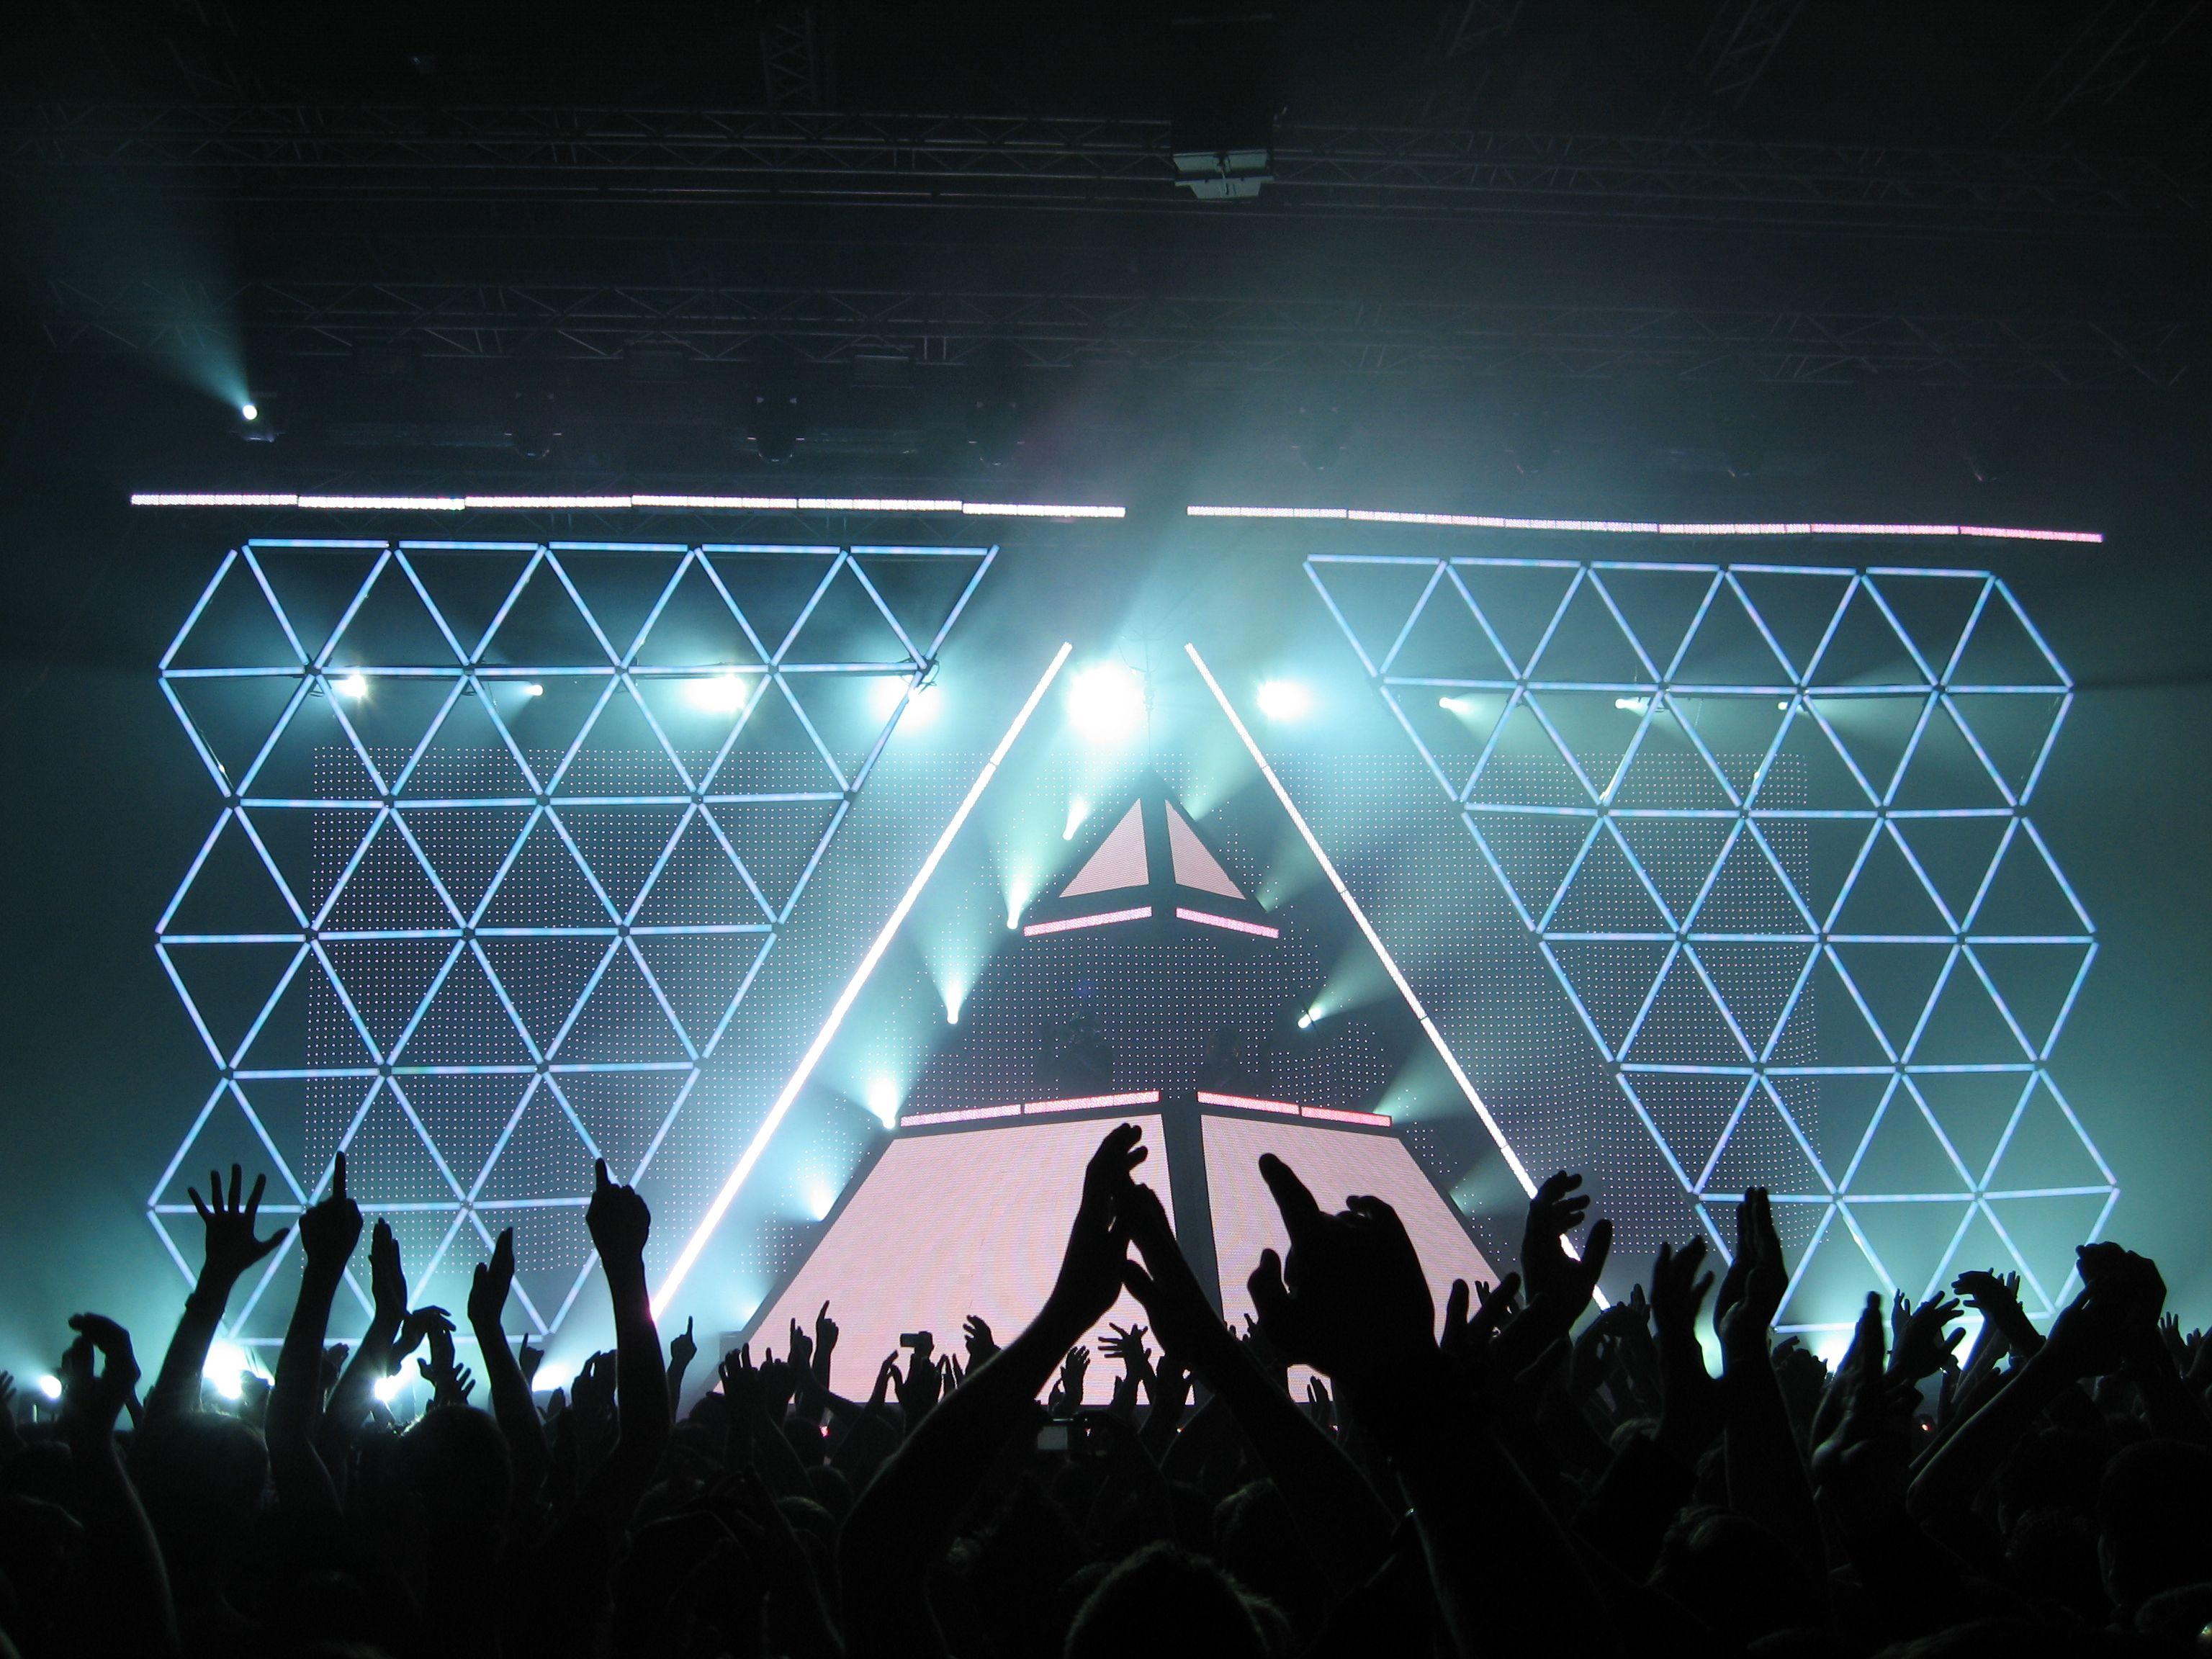 Daft Punk - Alive 2007 - Bercy   Stage design, Church ...